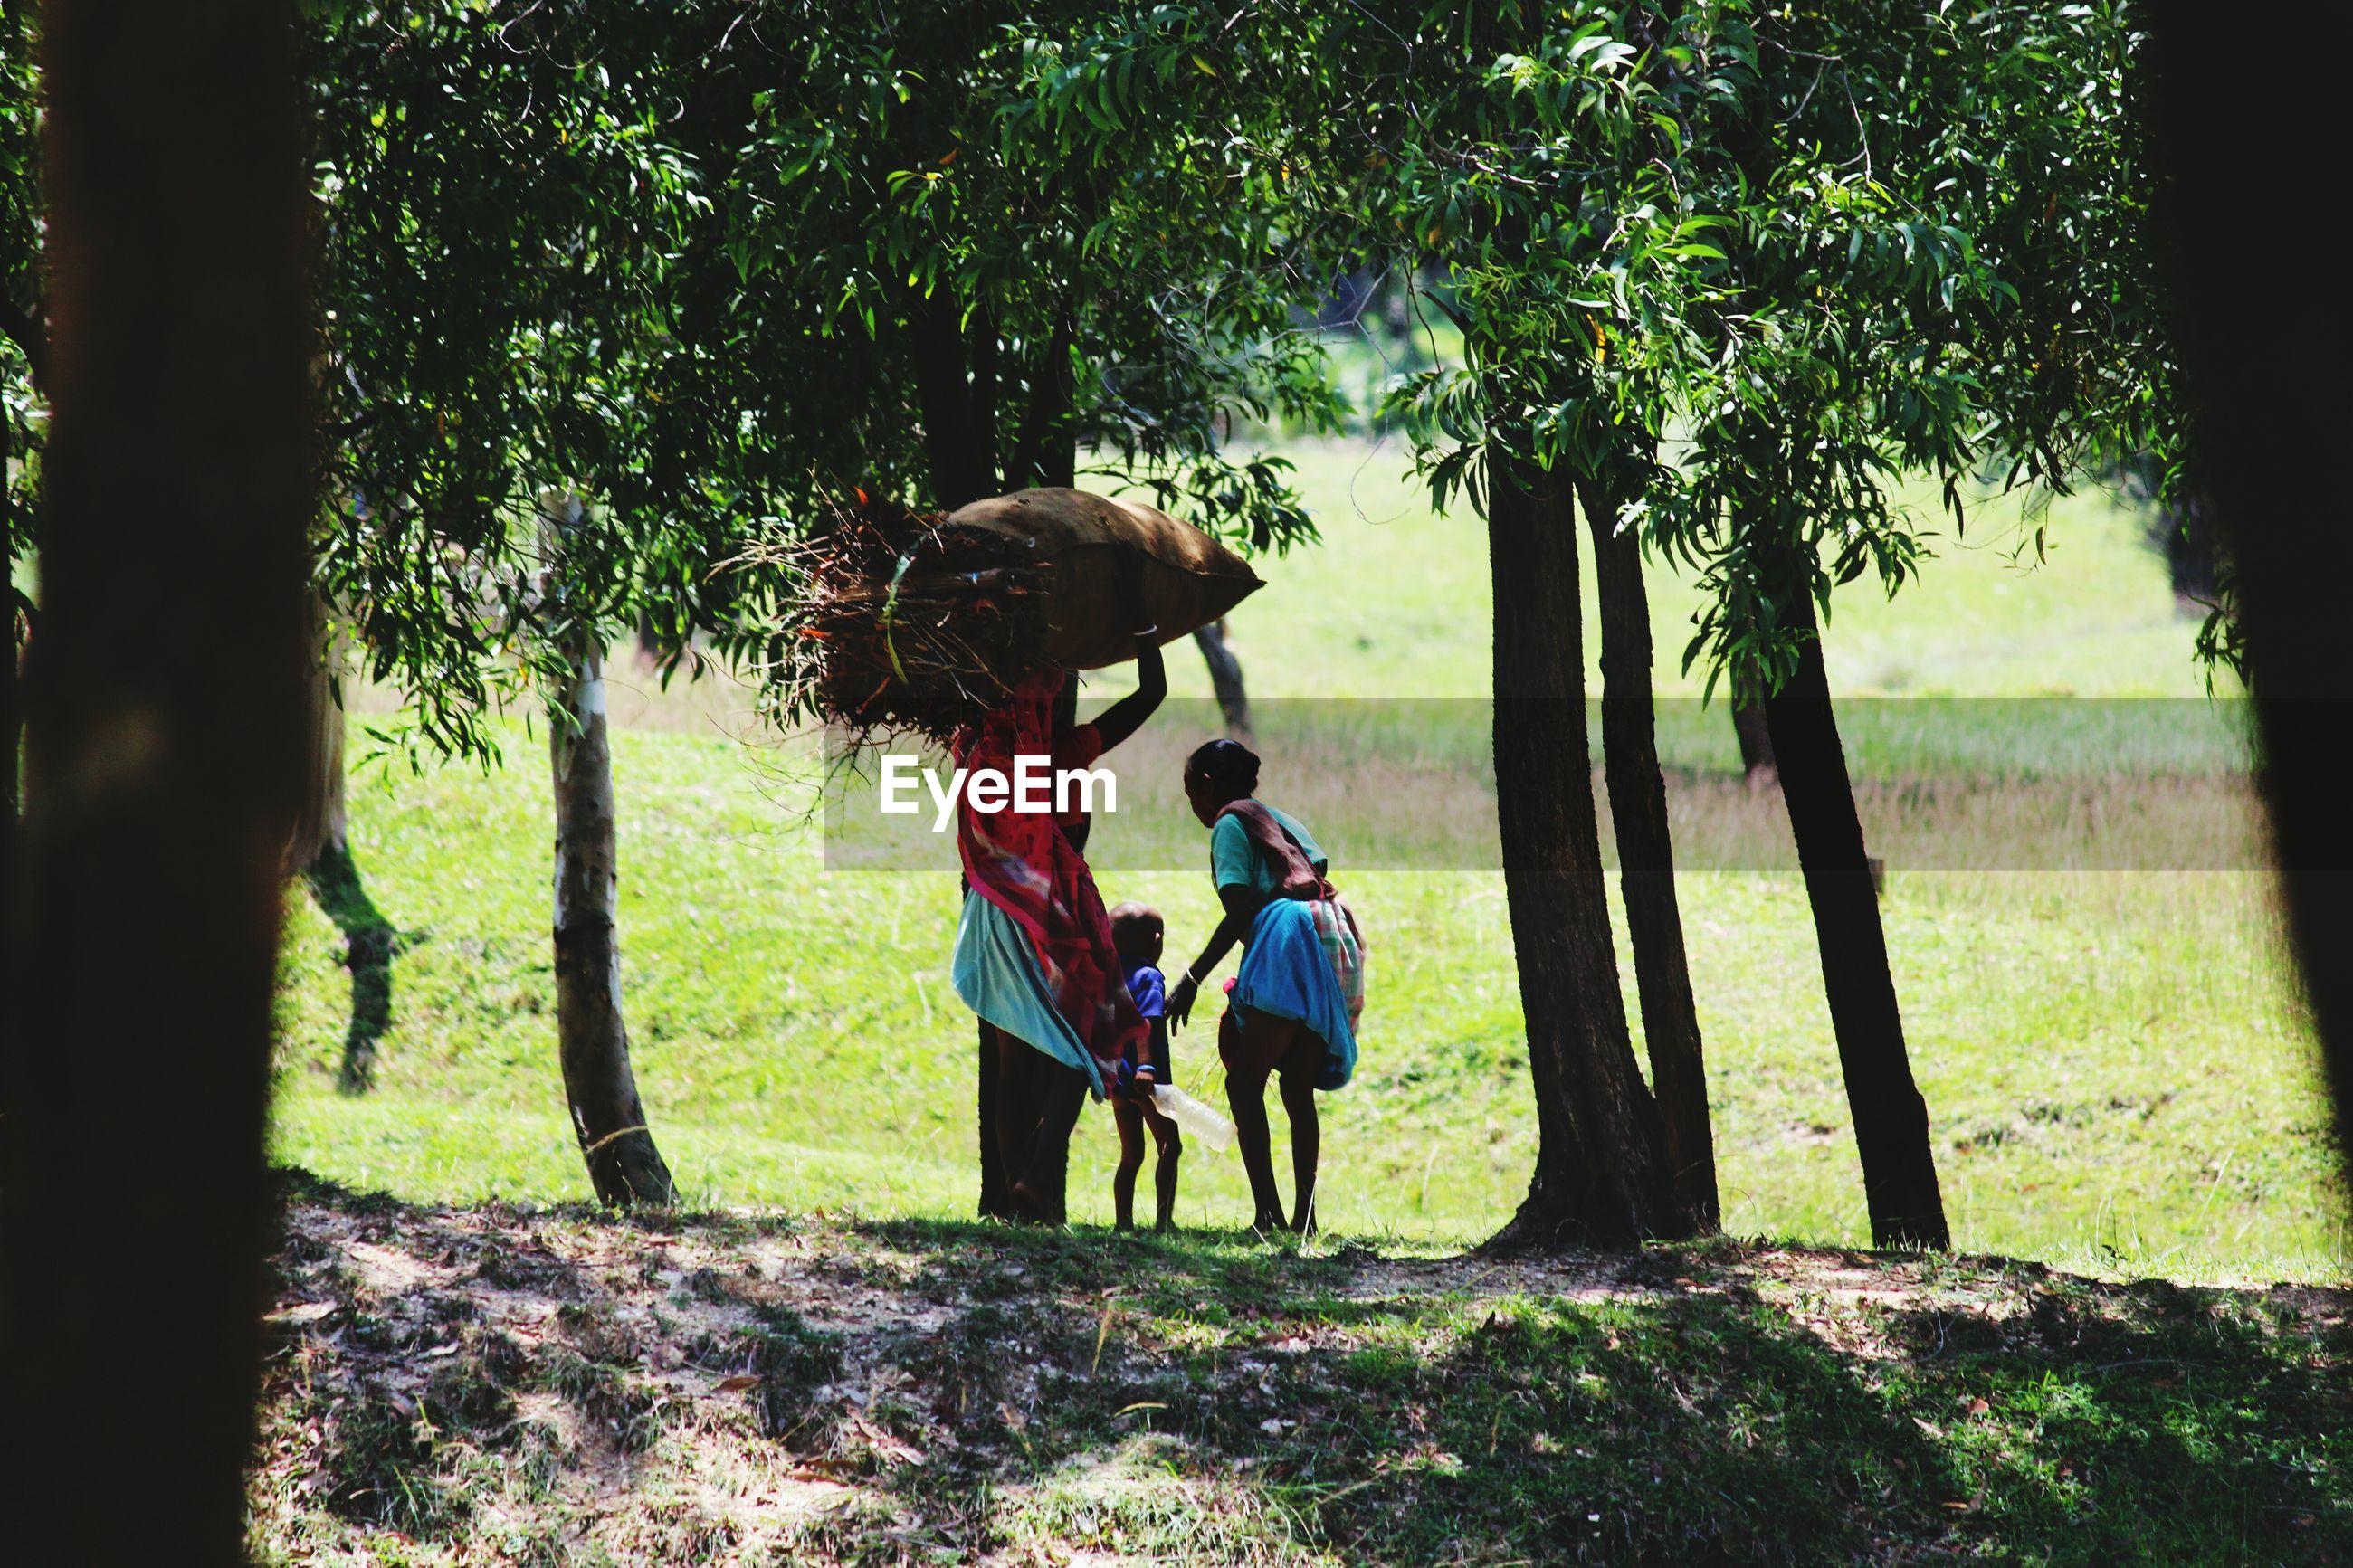 Women with boy standing on field